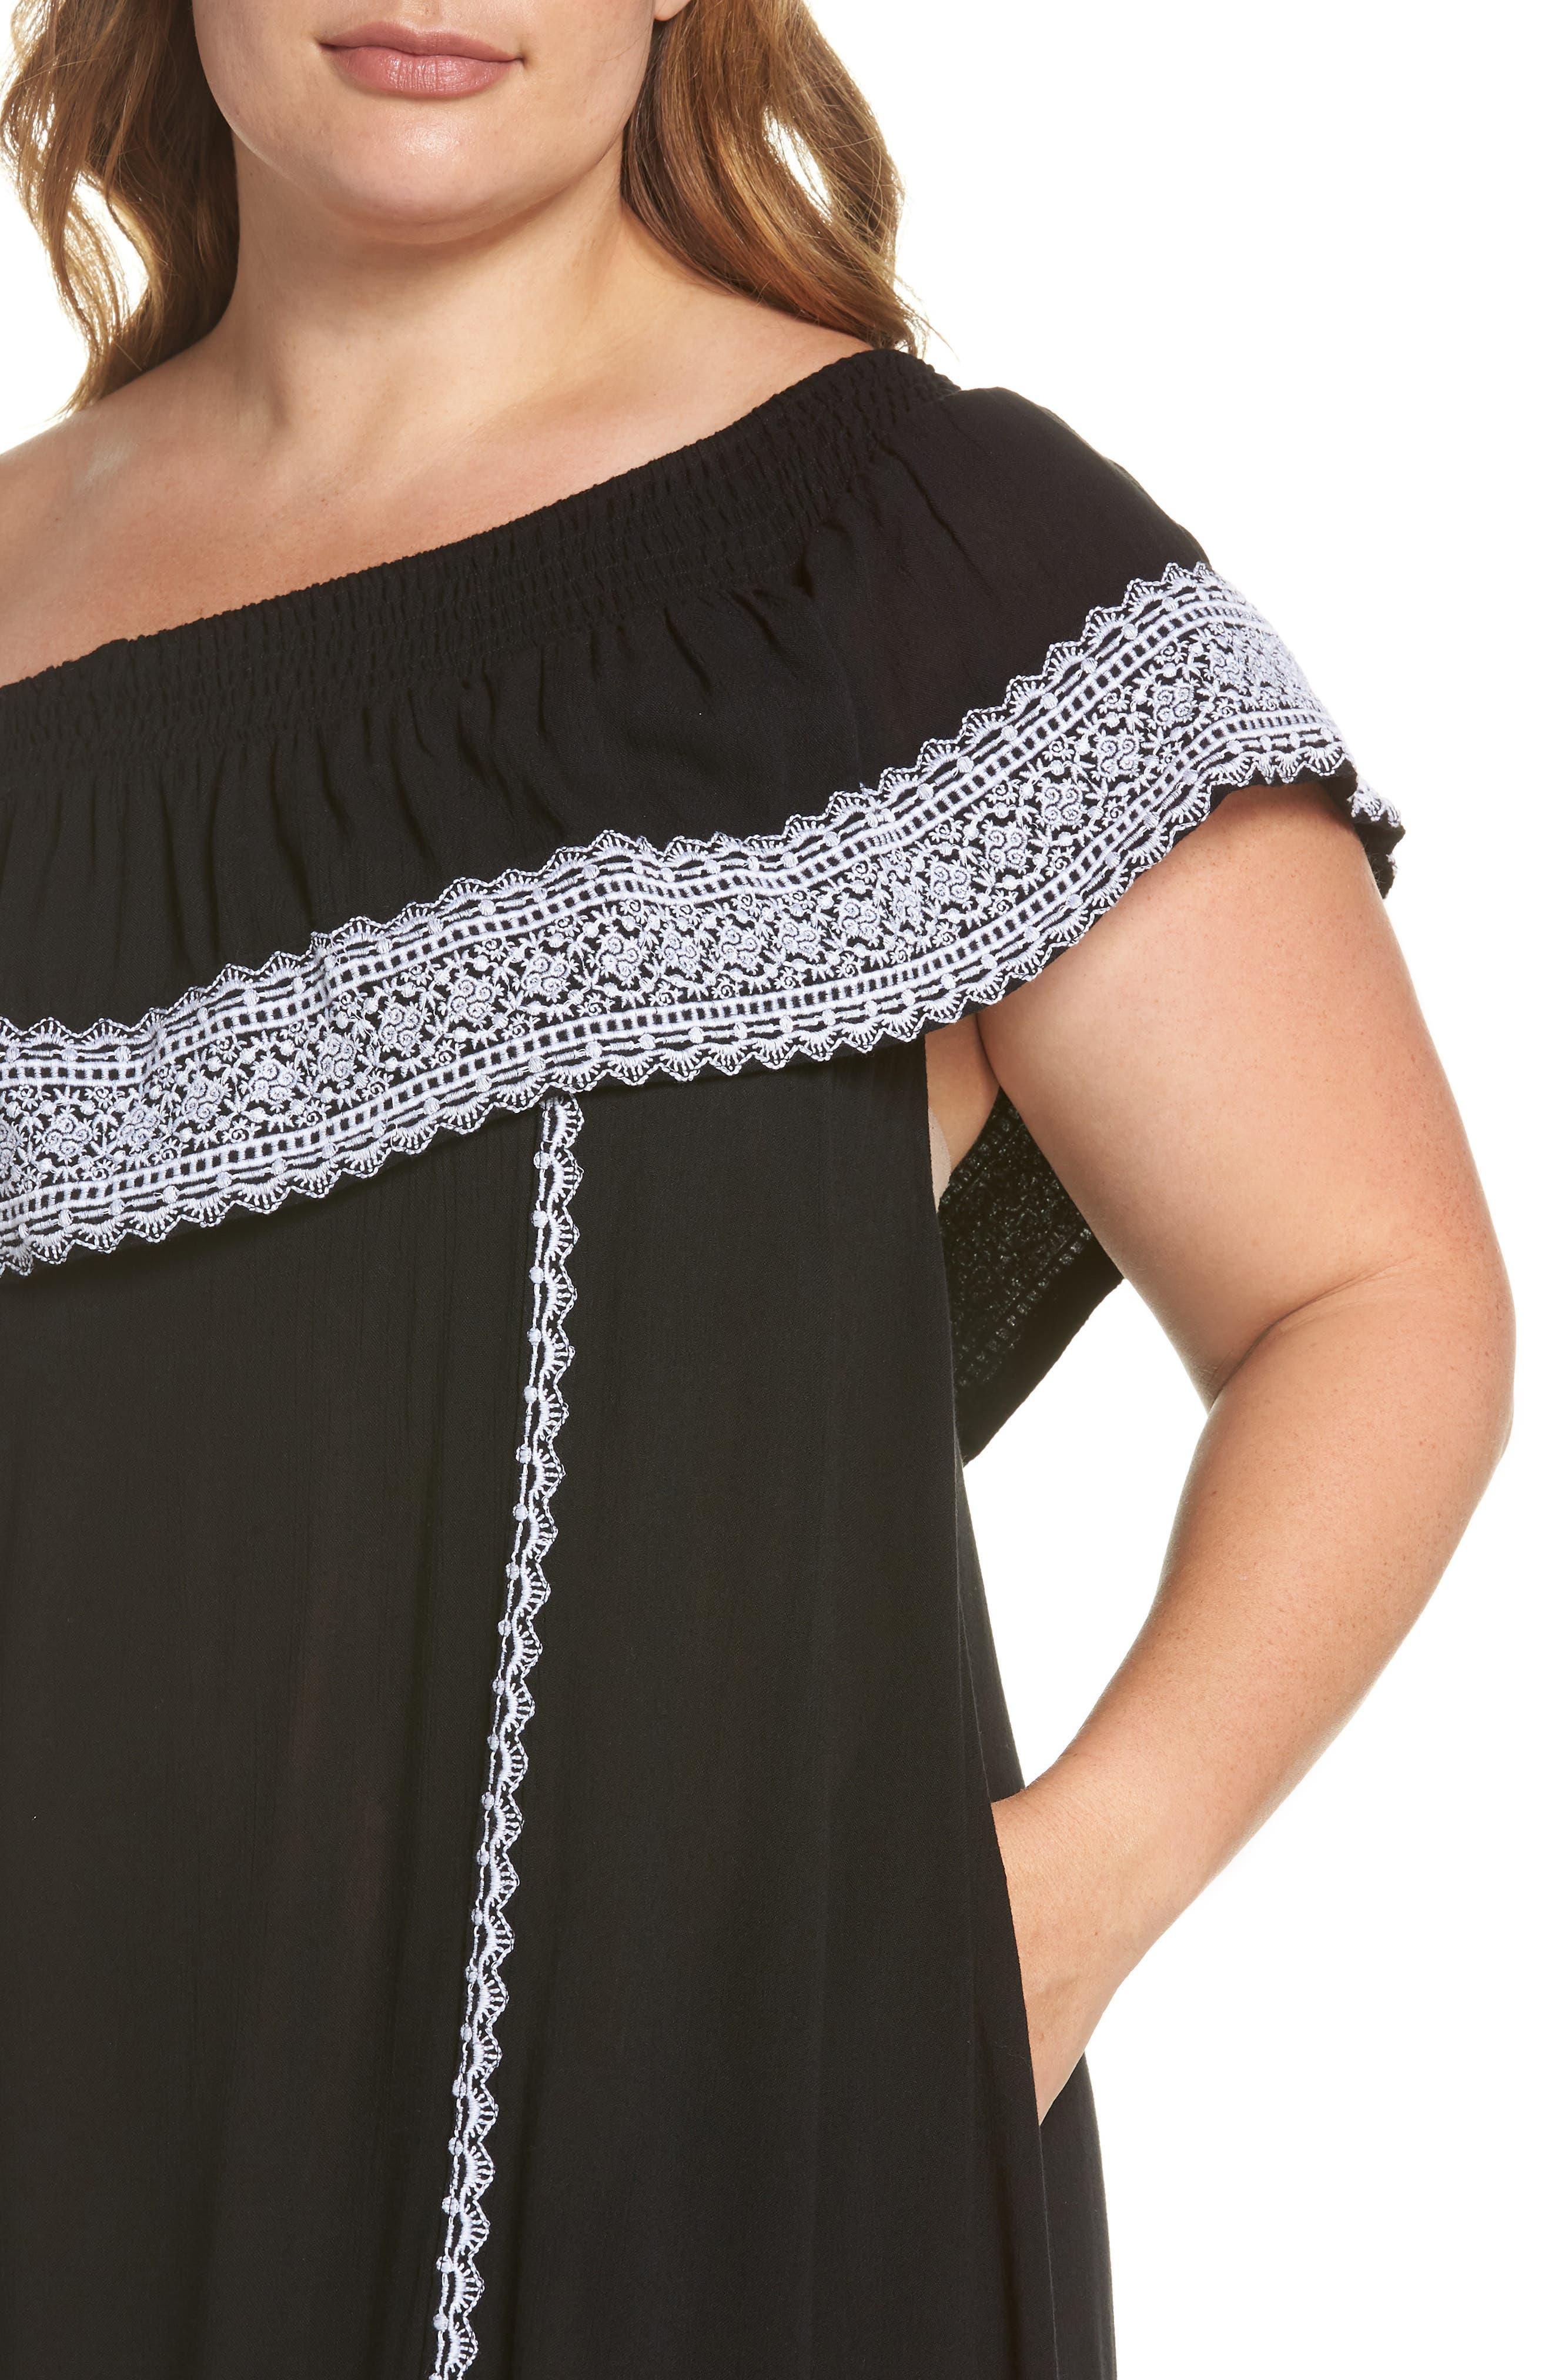 Gavin One-Shoulder Cover-Up Dress,                             Alternate thumbnail 4, color,                             002